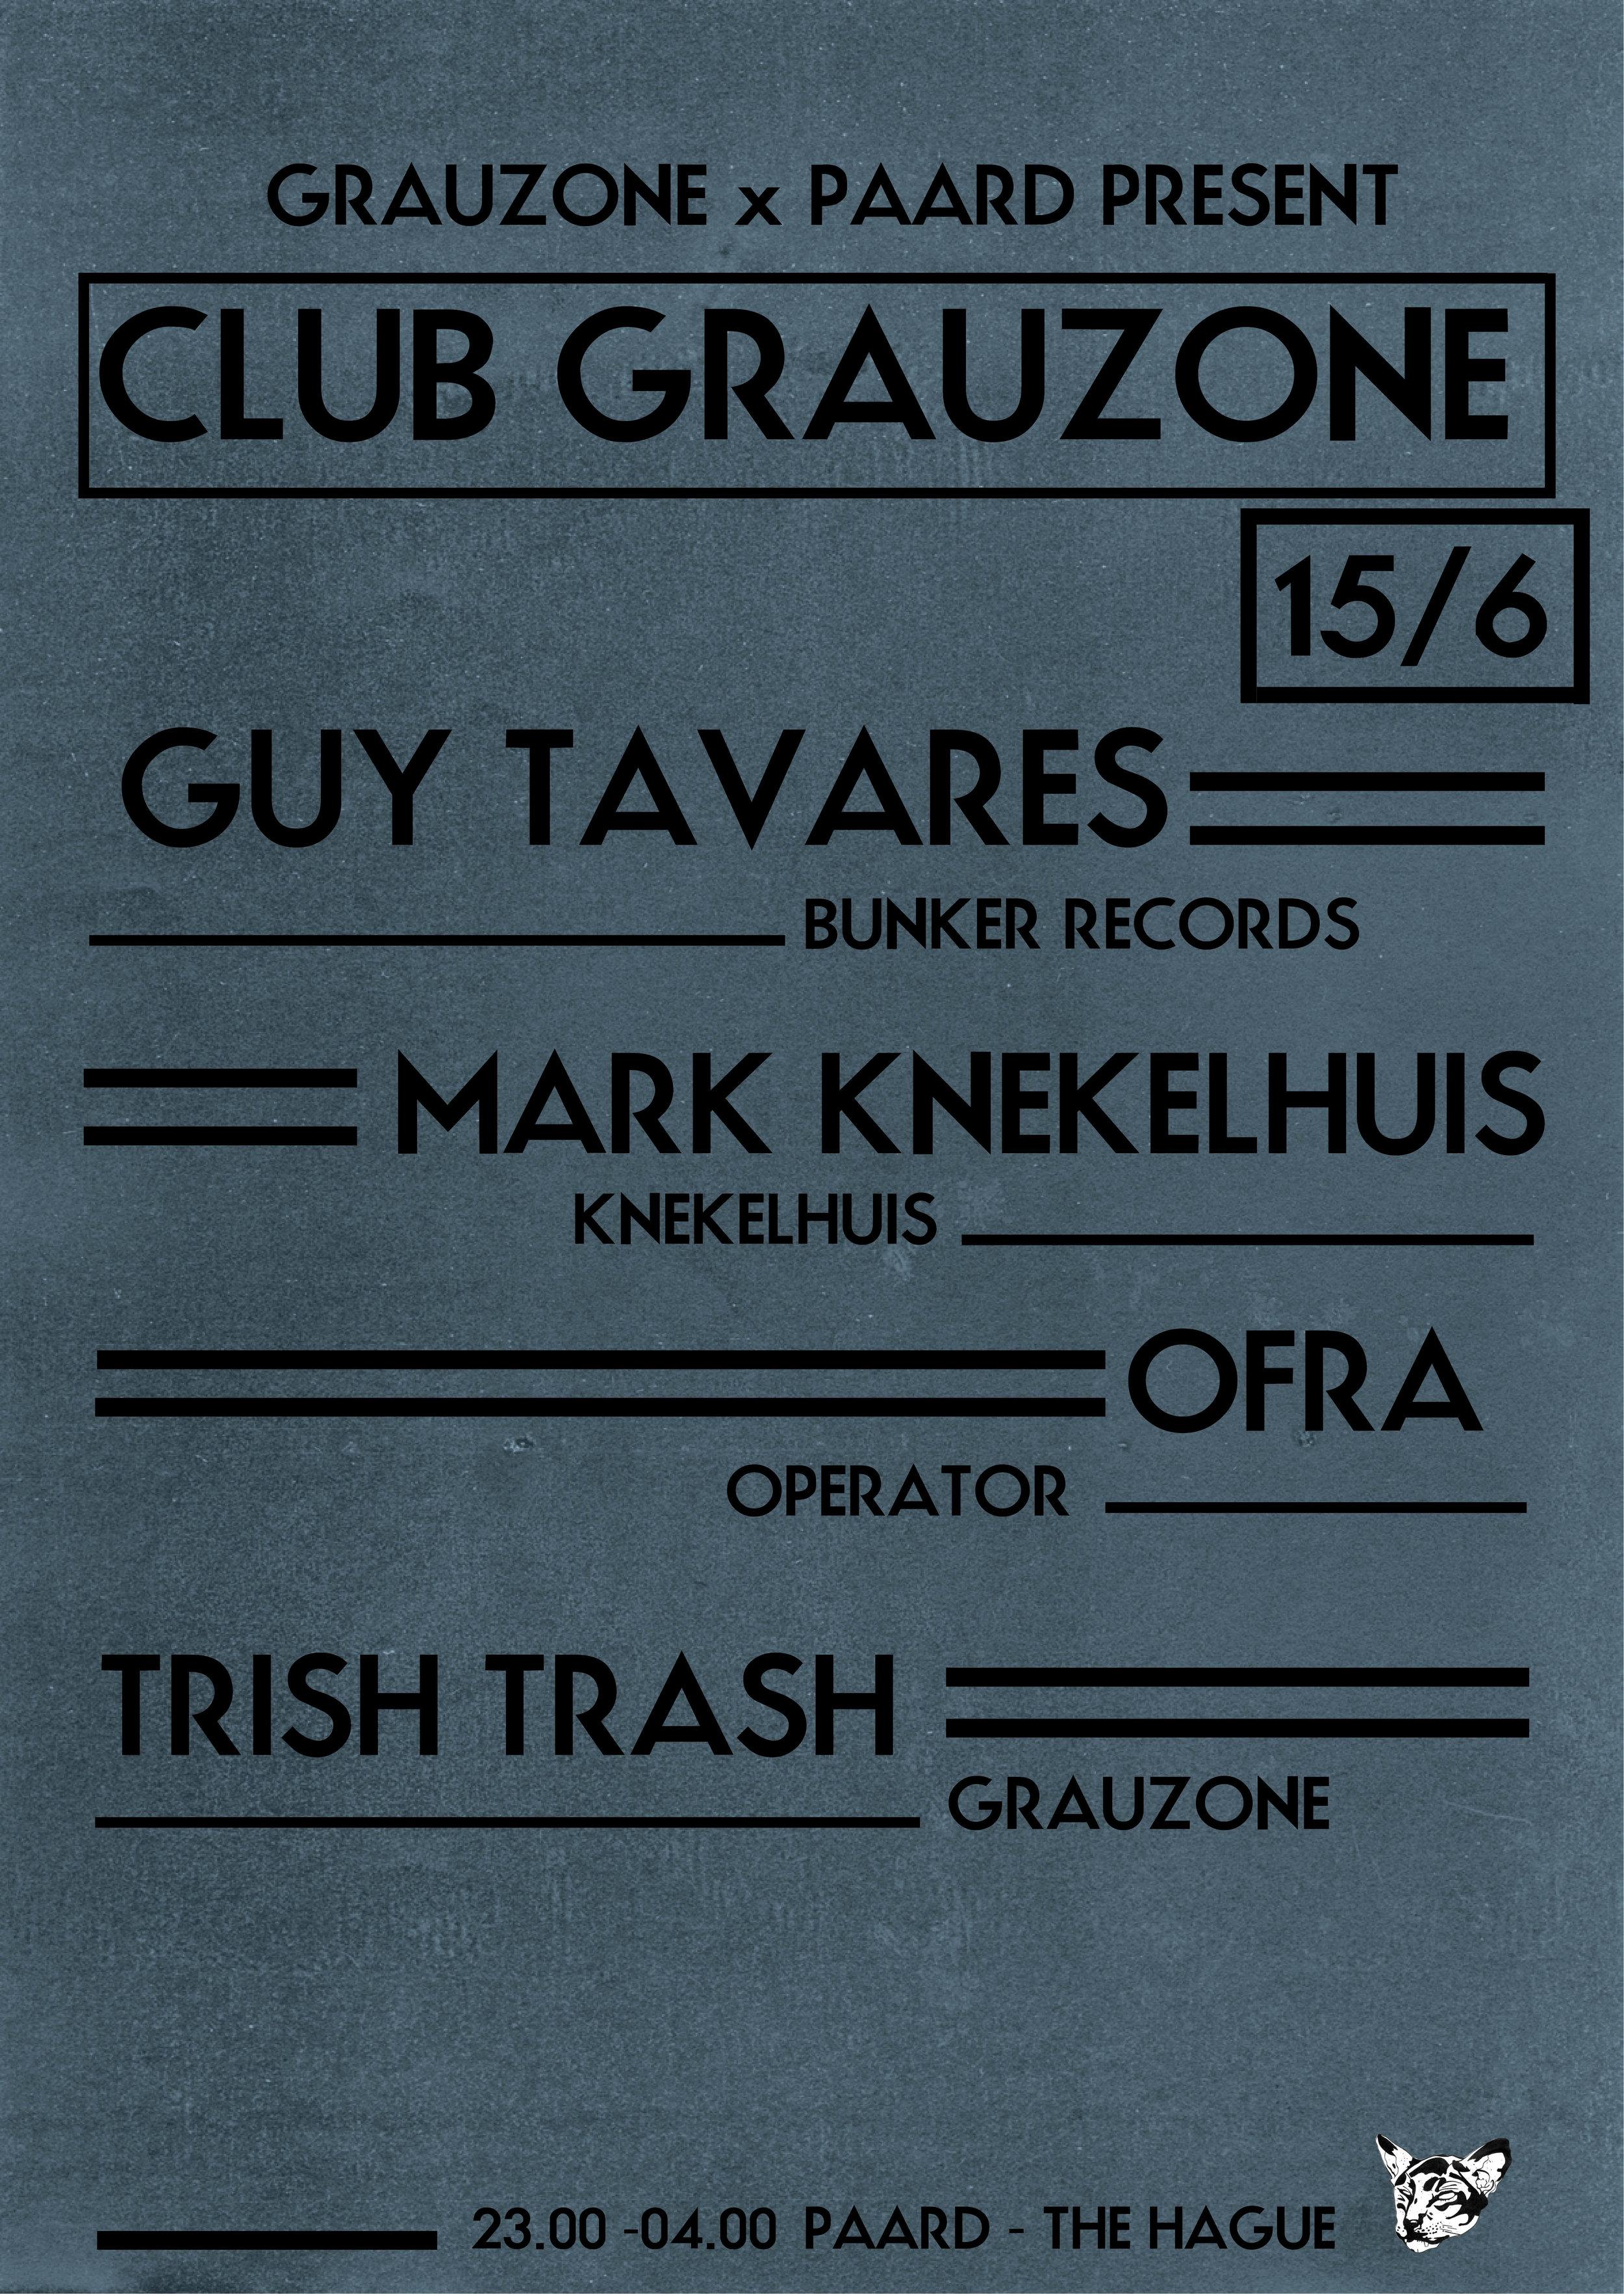 Club_Grauzone_June_2019.jpg